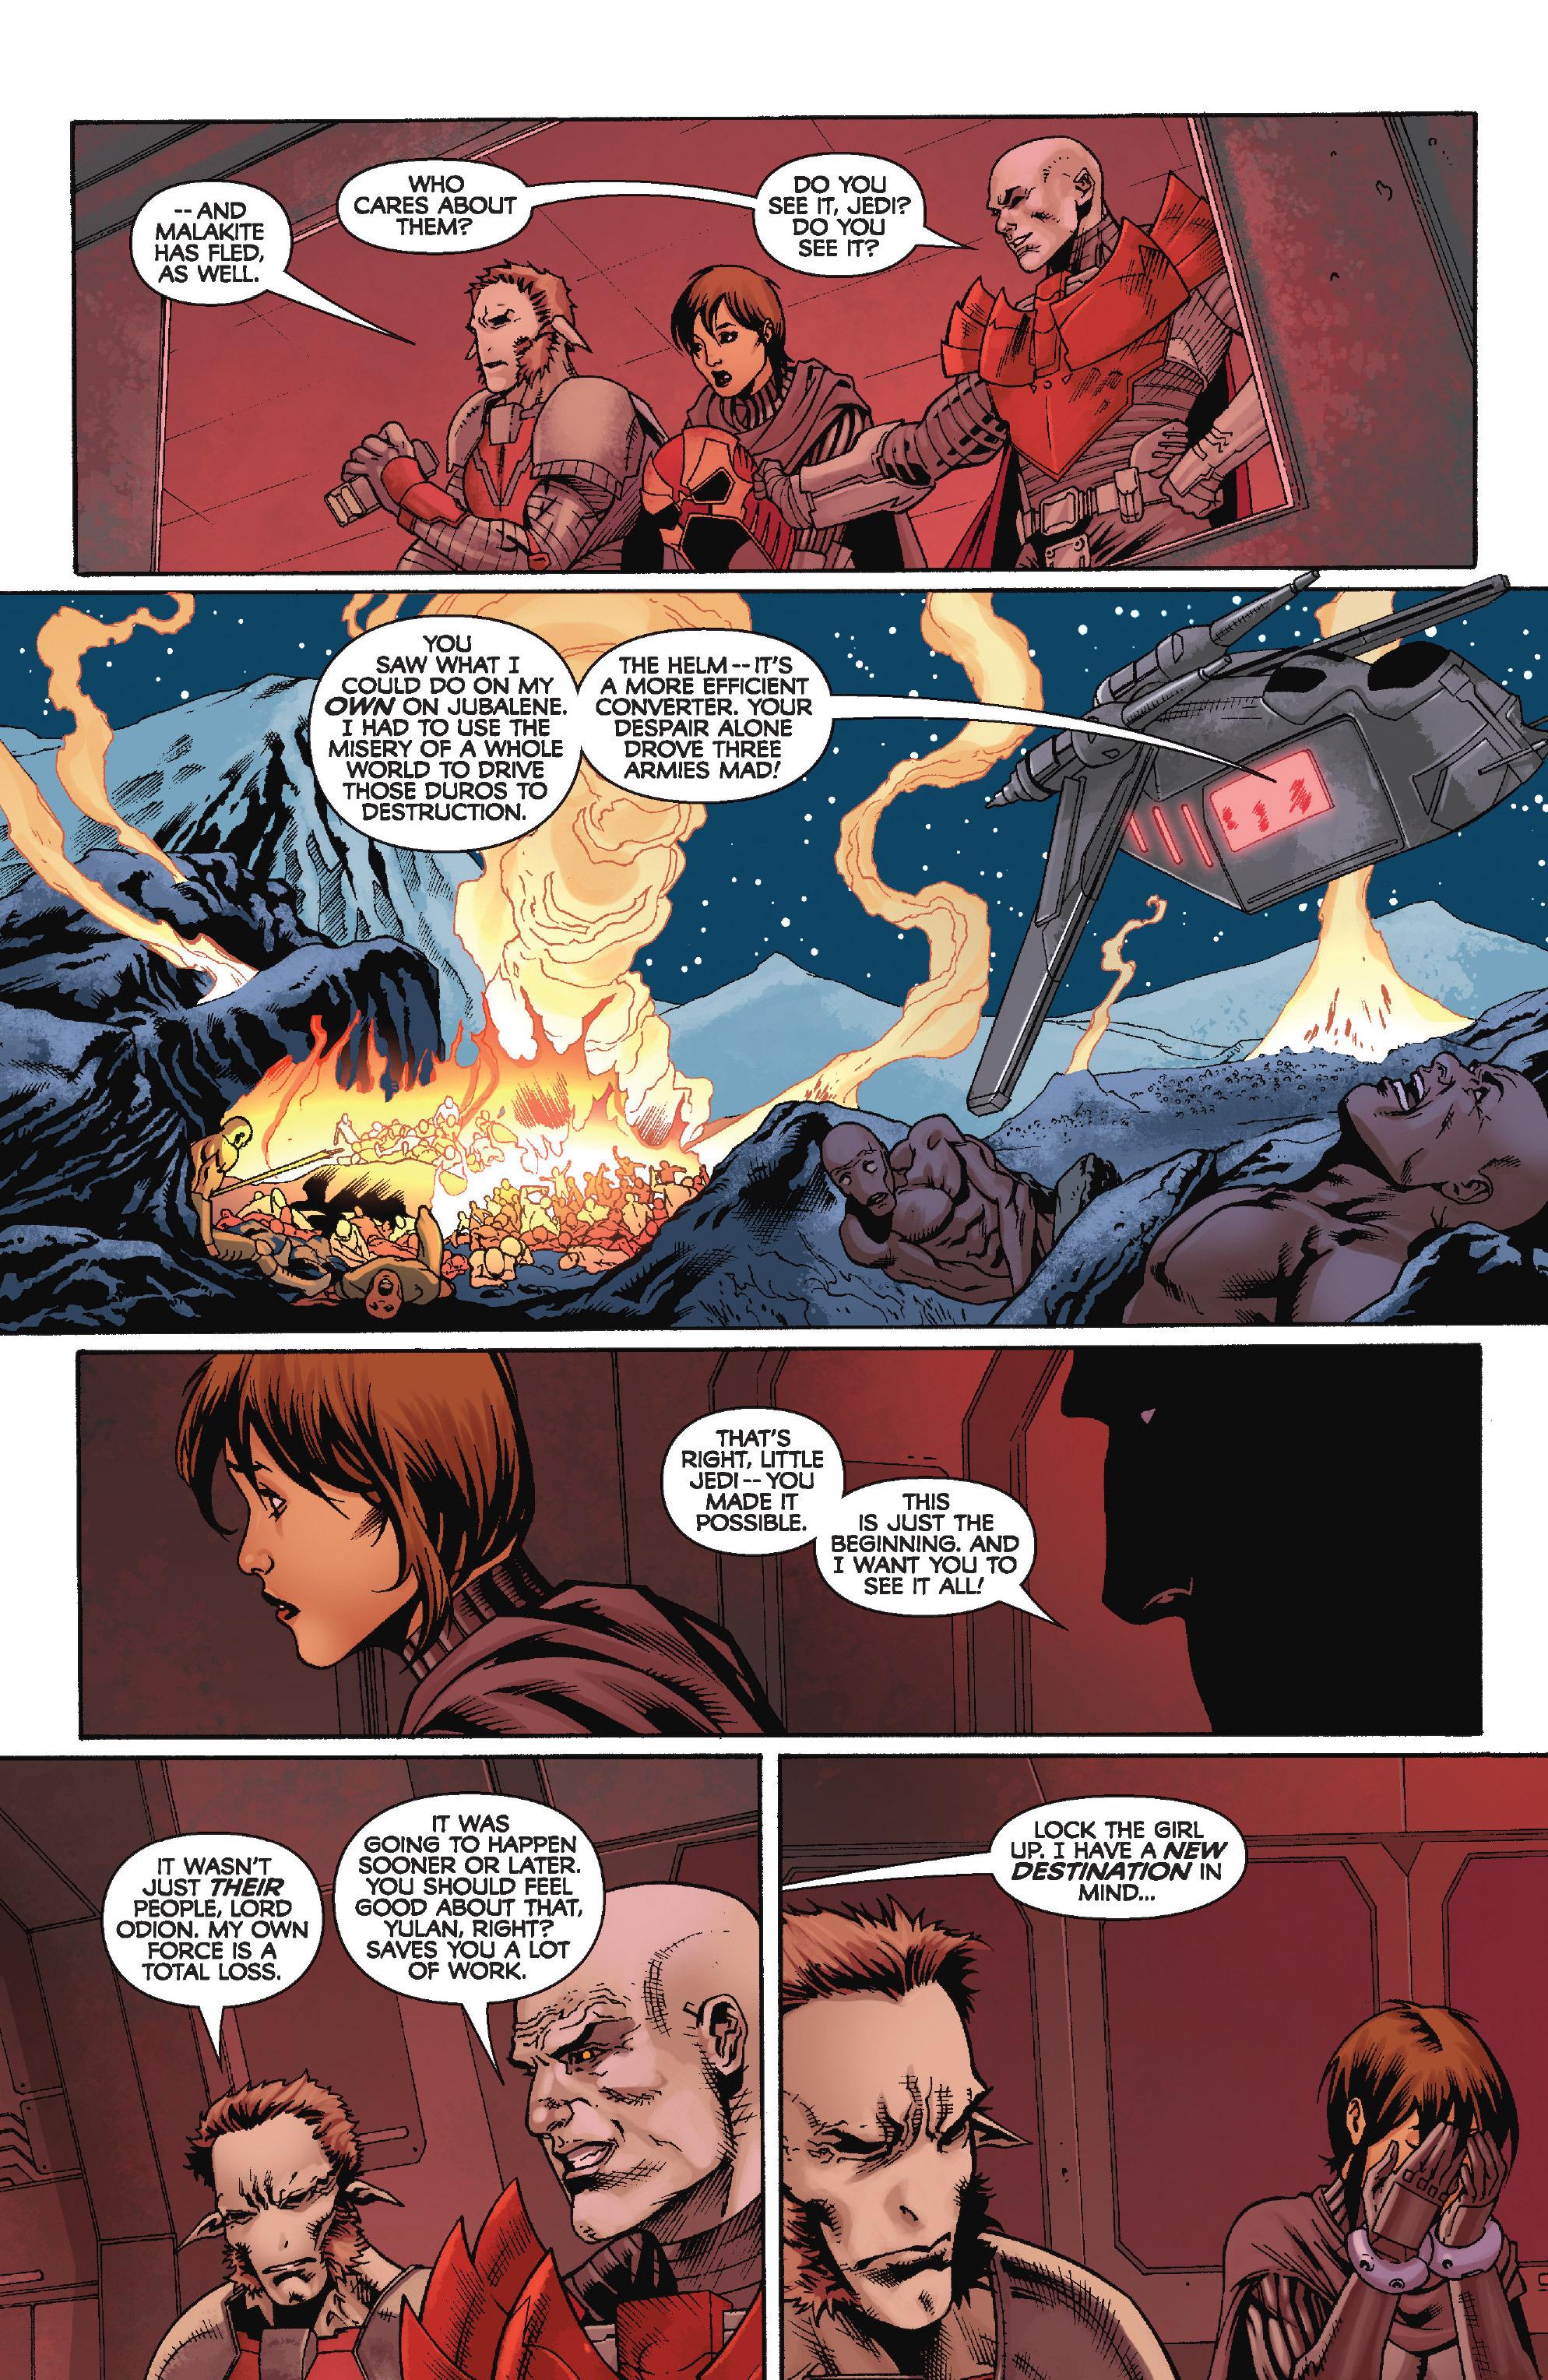 Read online Star Wars: Knight Errant - Escape comic -  Issue #4 - 16